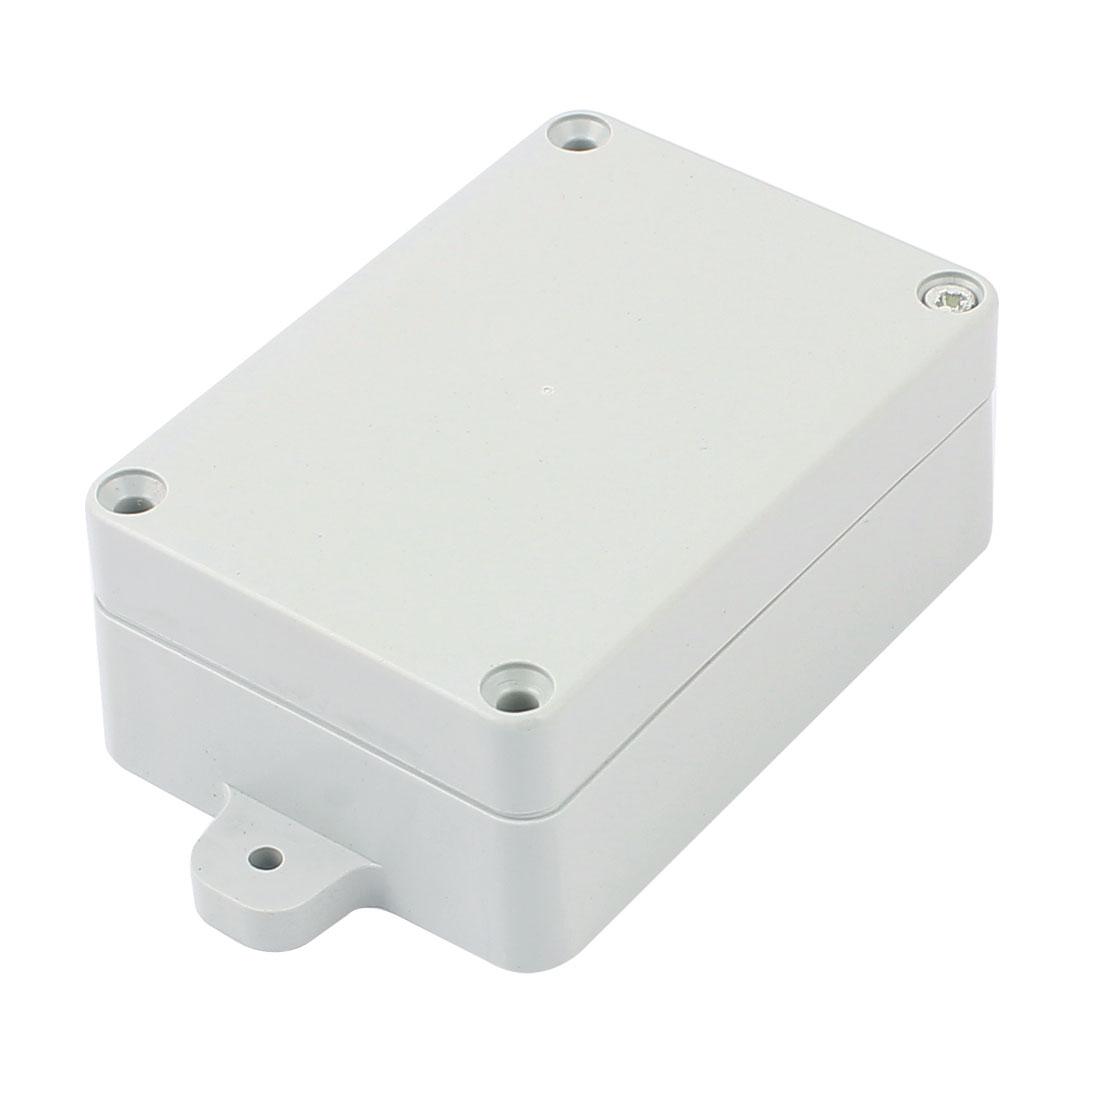 Dustproof IP65 Plastic Enclosure Project Case DIY Junction Box 83x58x34mm